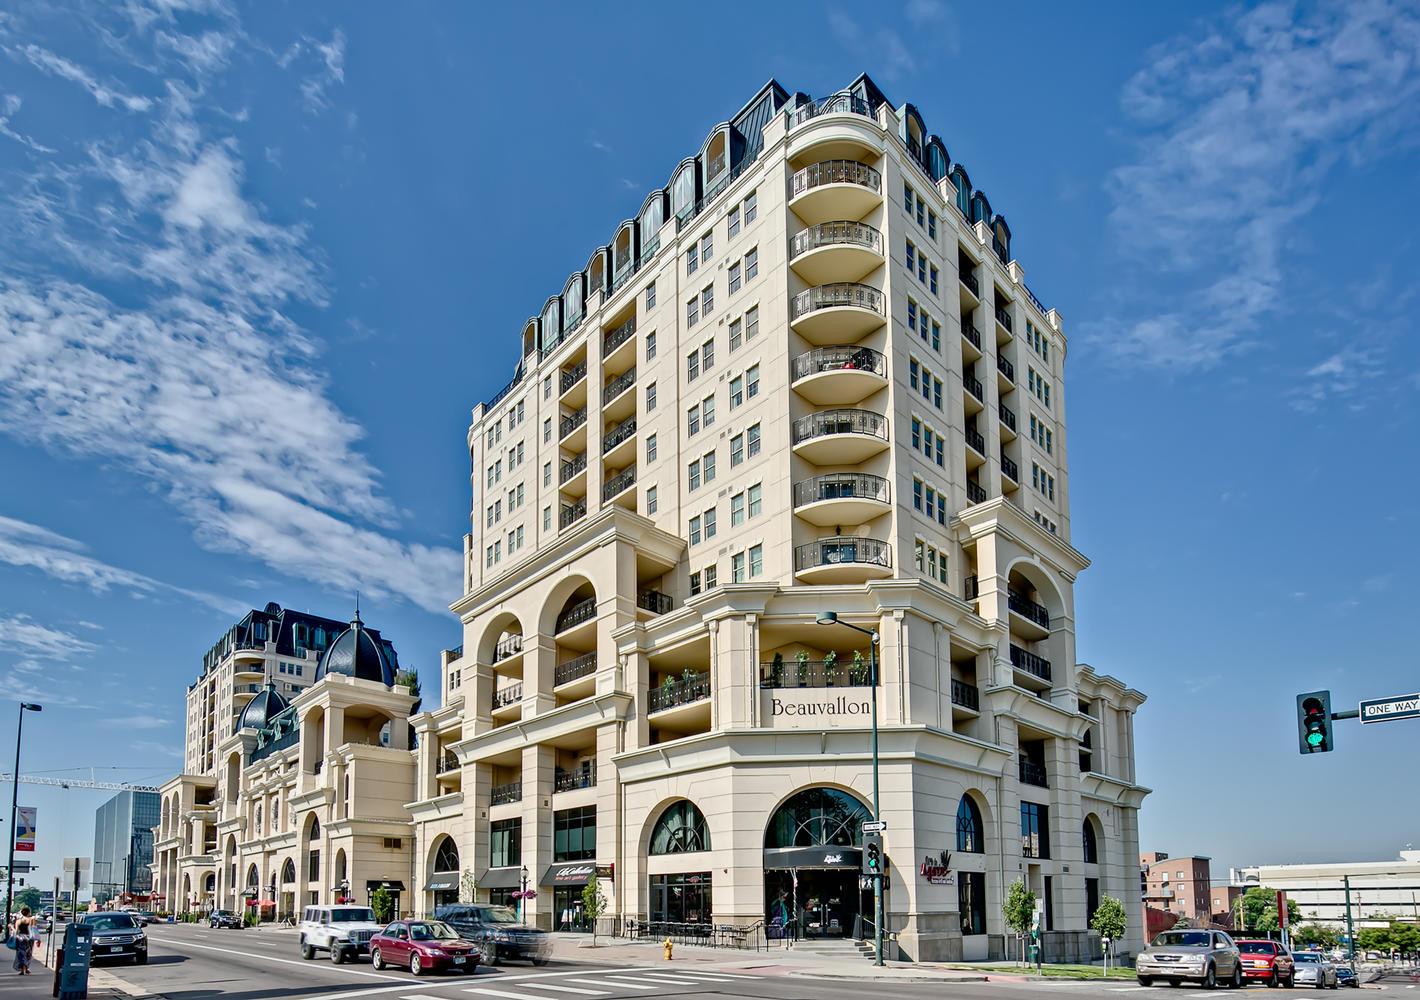 Casa Unifamiliar por un Venta en Spectacular custom designed Downtown Penthouse 975 N Lincoln St #14D-N Denver, Colorado, 80203 Estados Unidos